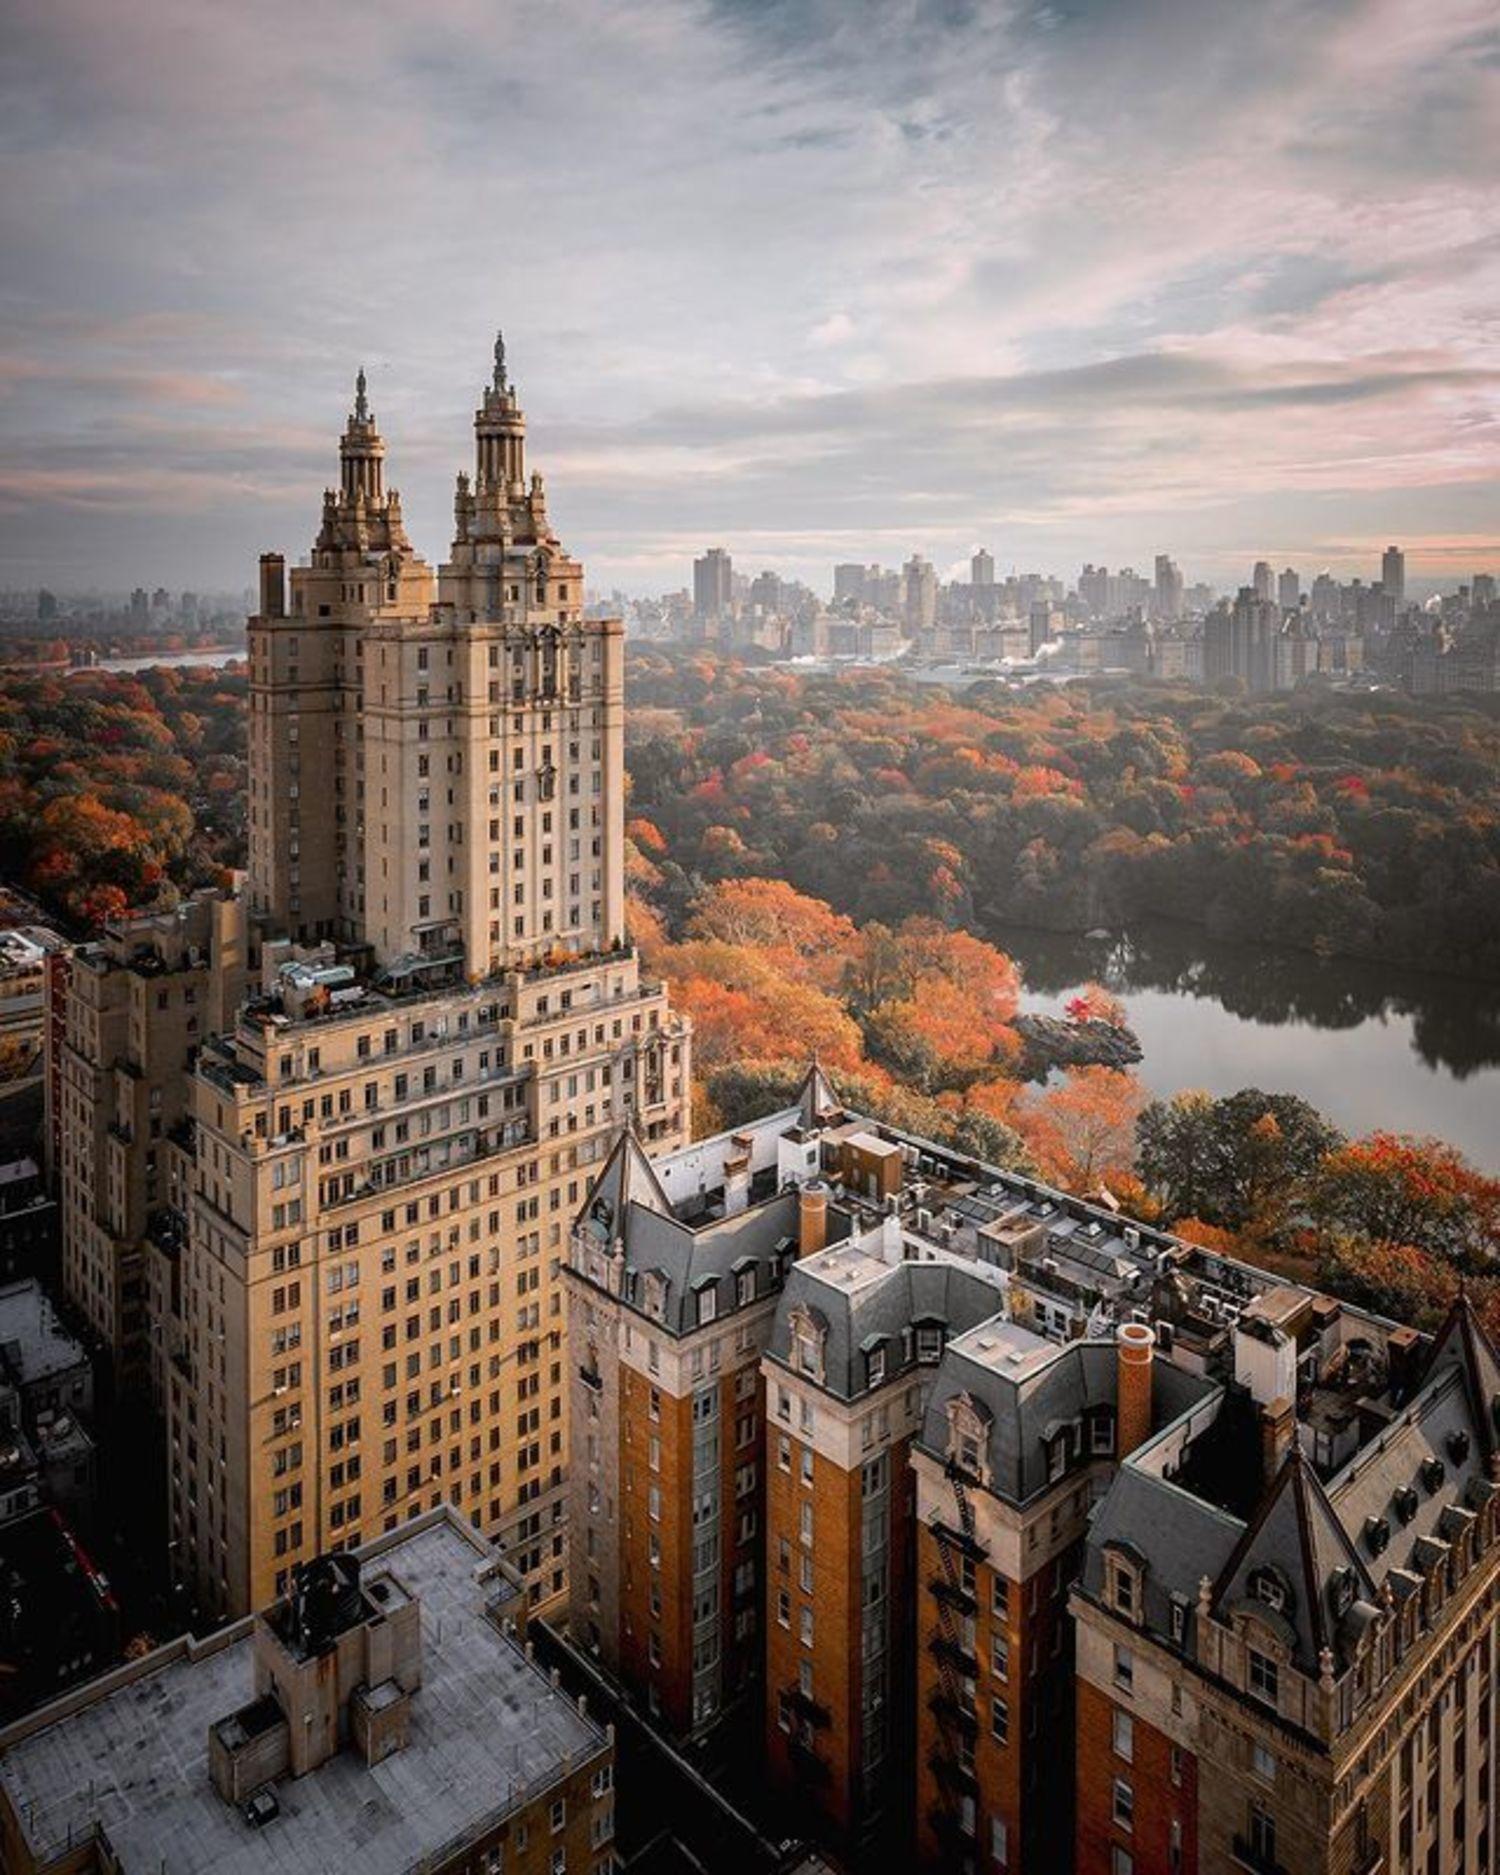 Upper West Side and Central Park, Manhattan